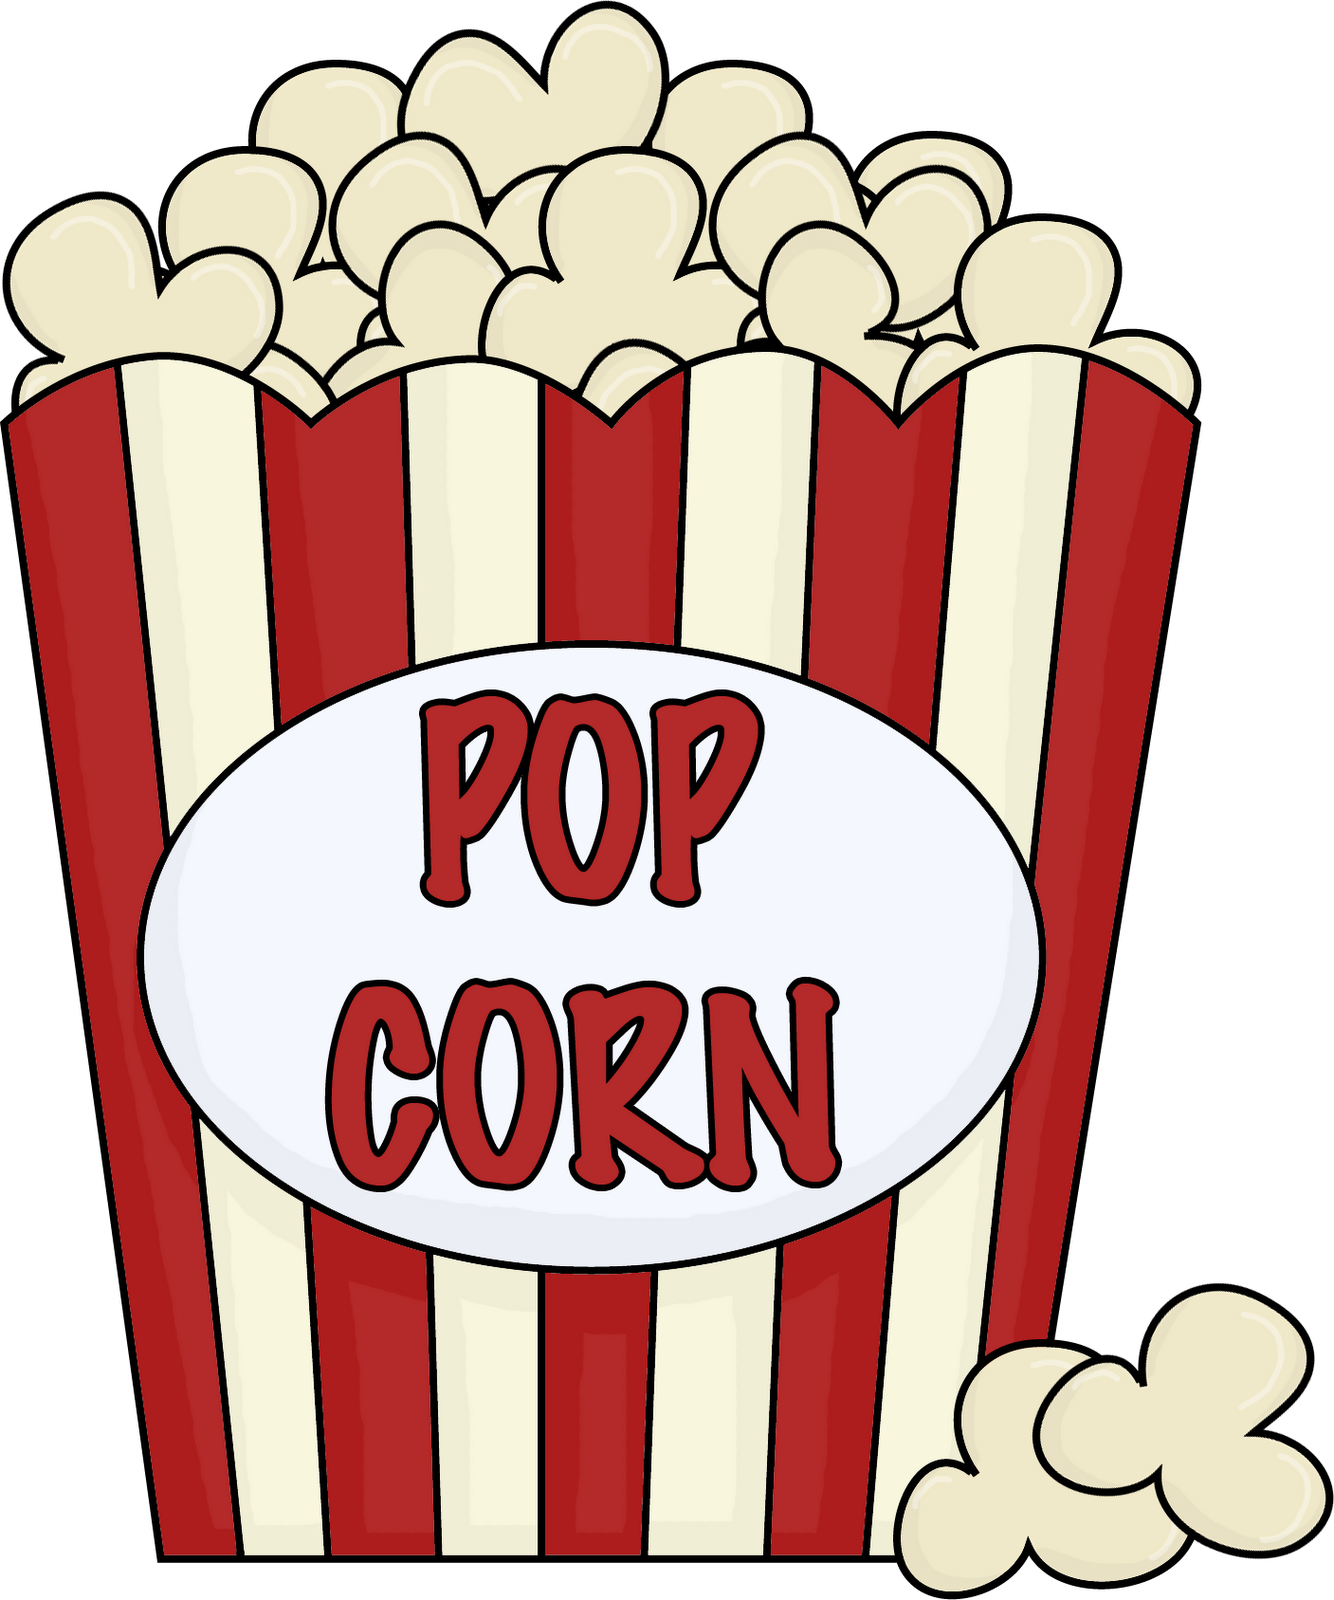 Popcorn clip art black and white outline free